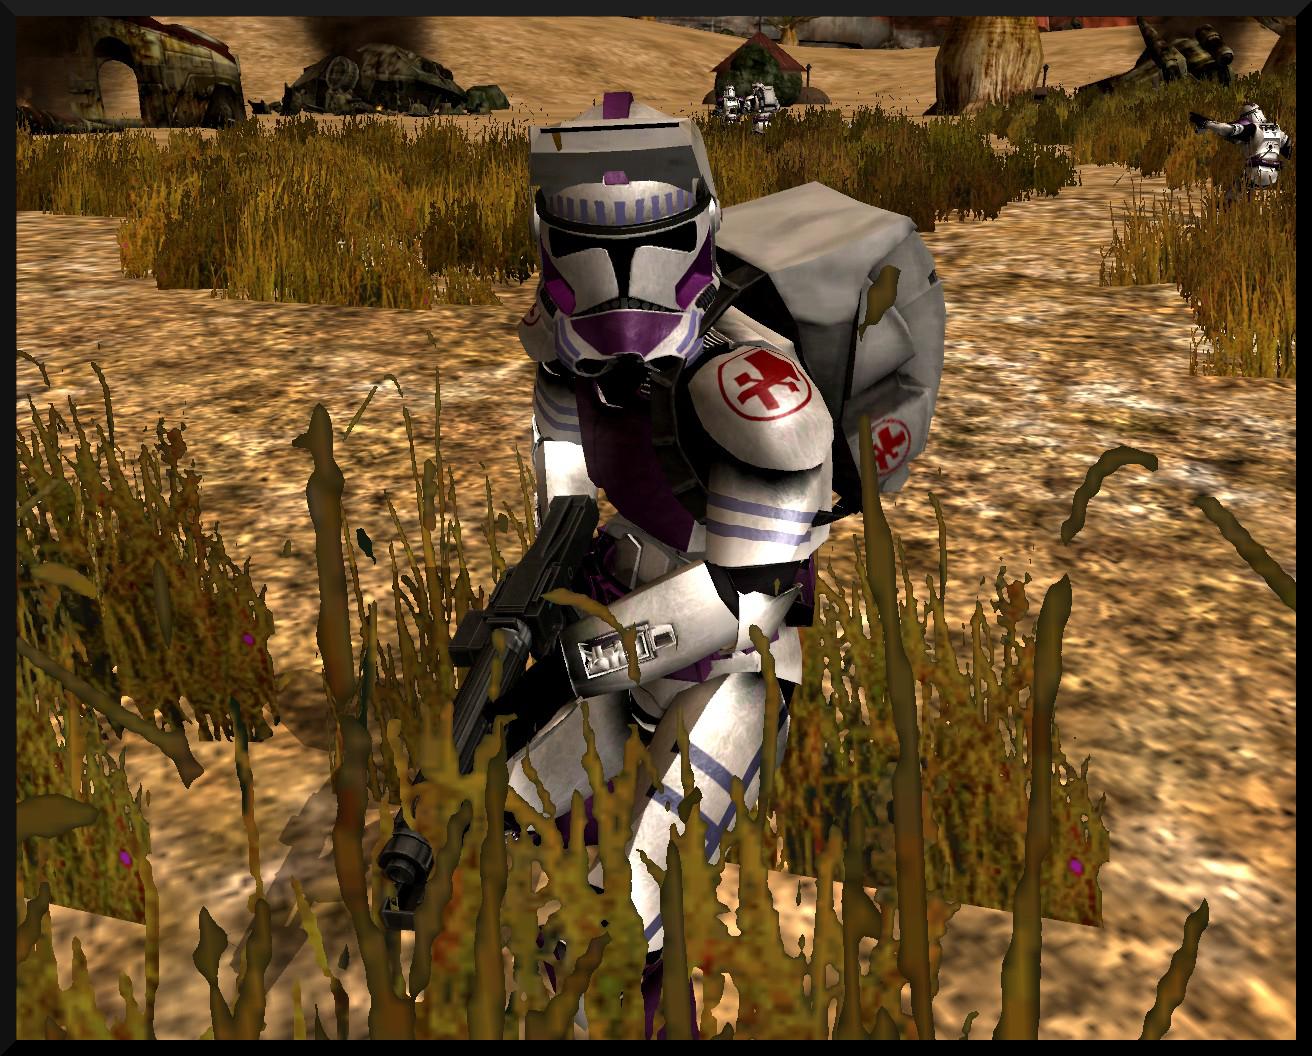 187th Medic2 Dantooine